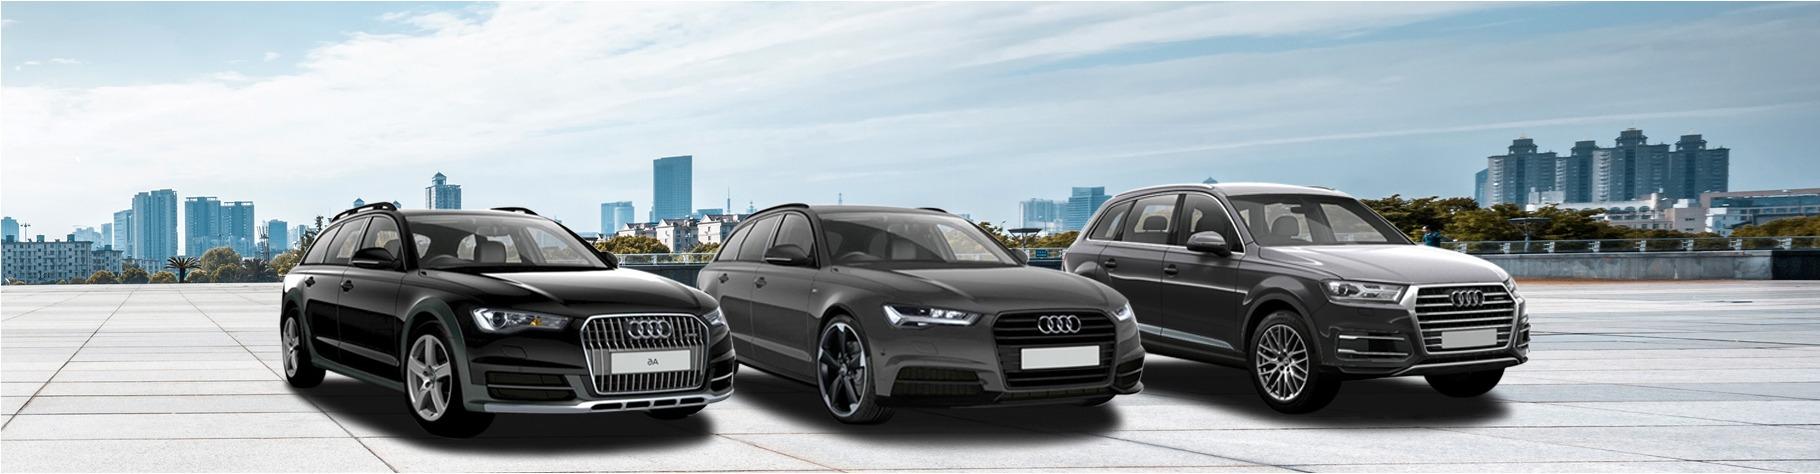 Guide d'achat Audi